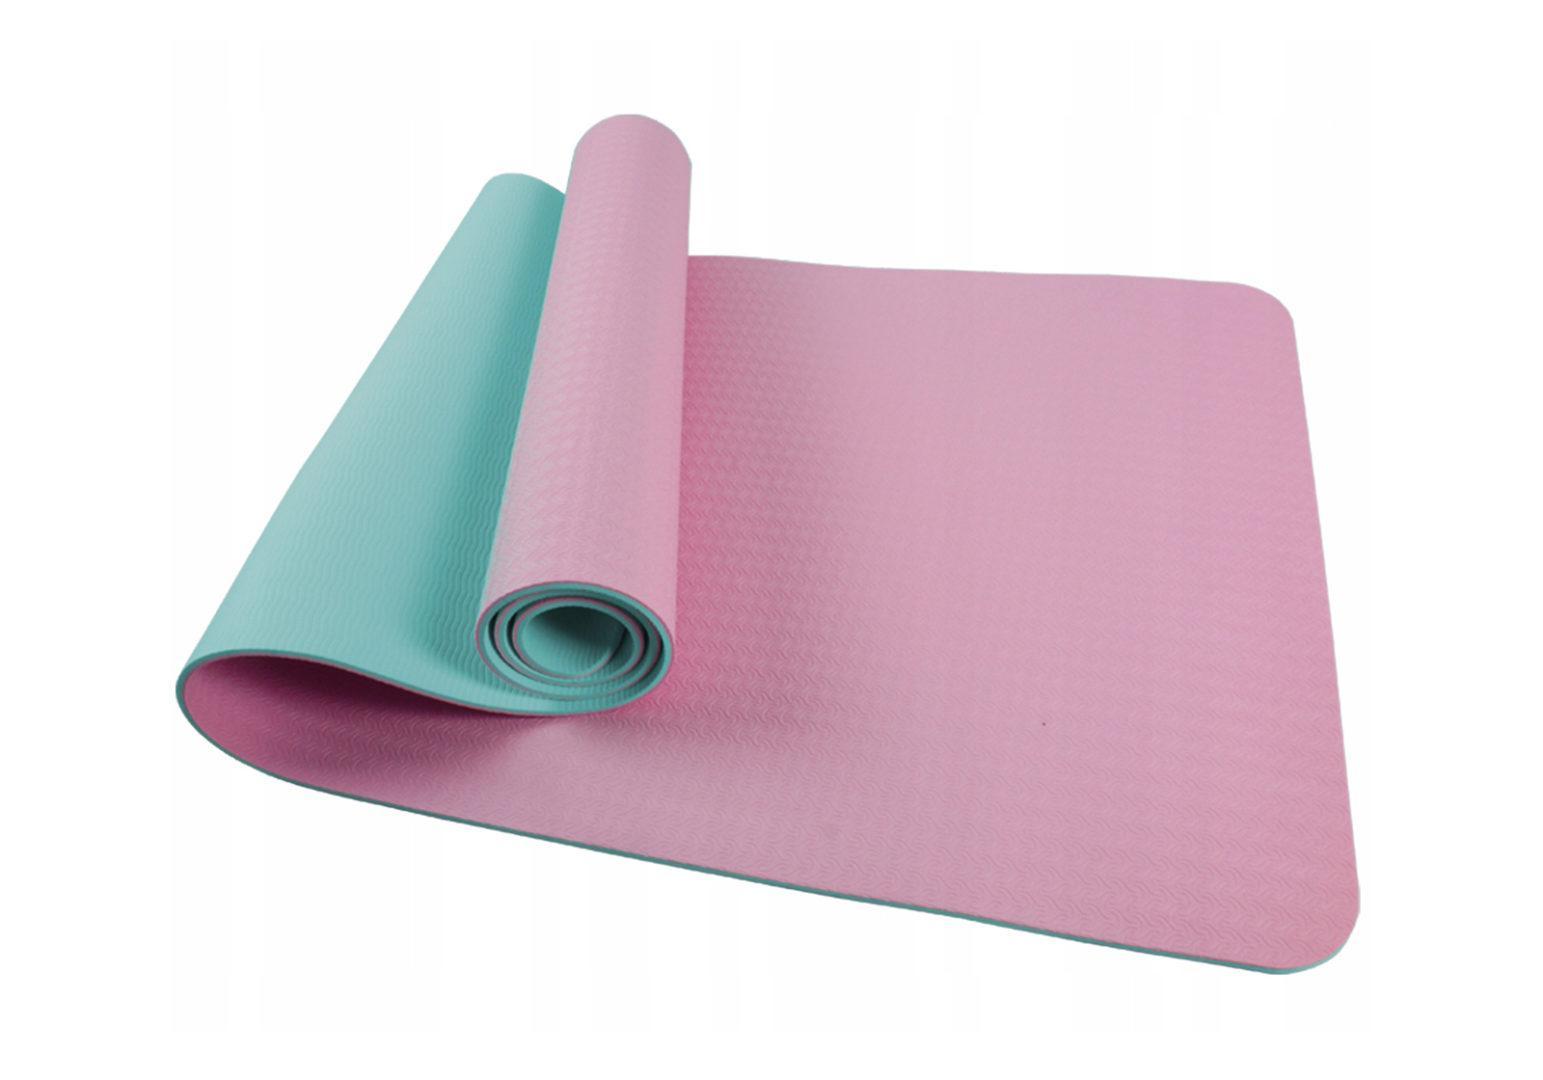 Yoga-Mat-TPE-Hanuman-Two-Tones-Pink-Mint-1-1543×1080.jpg